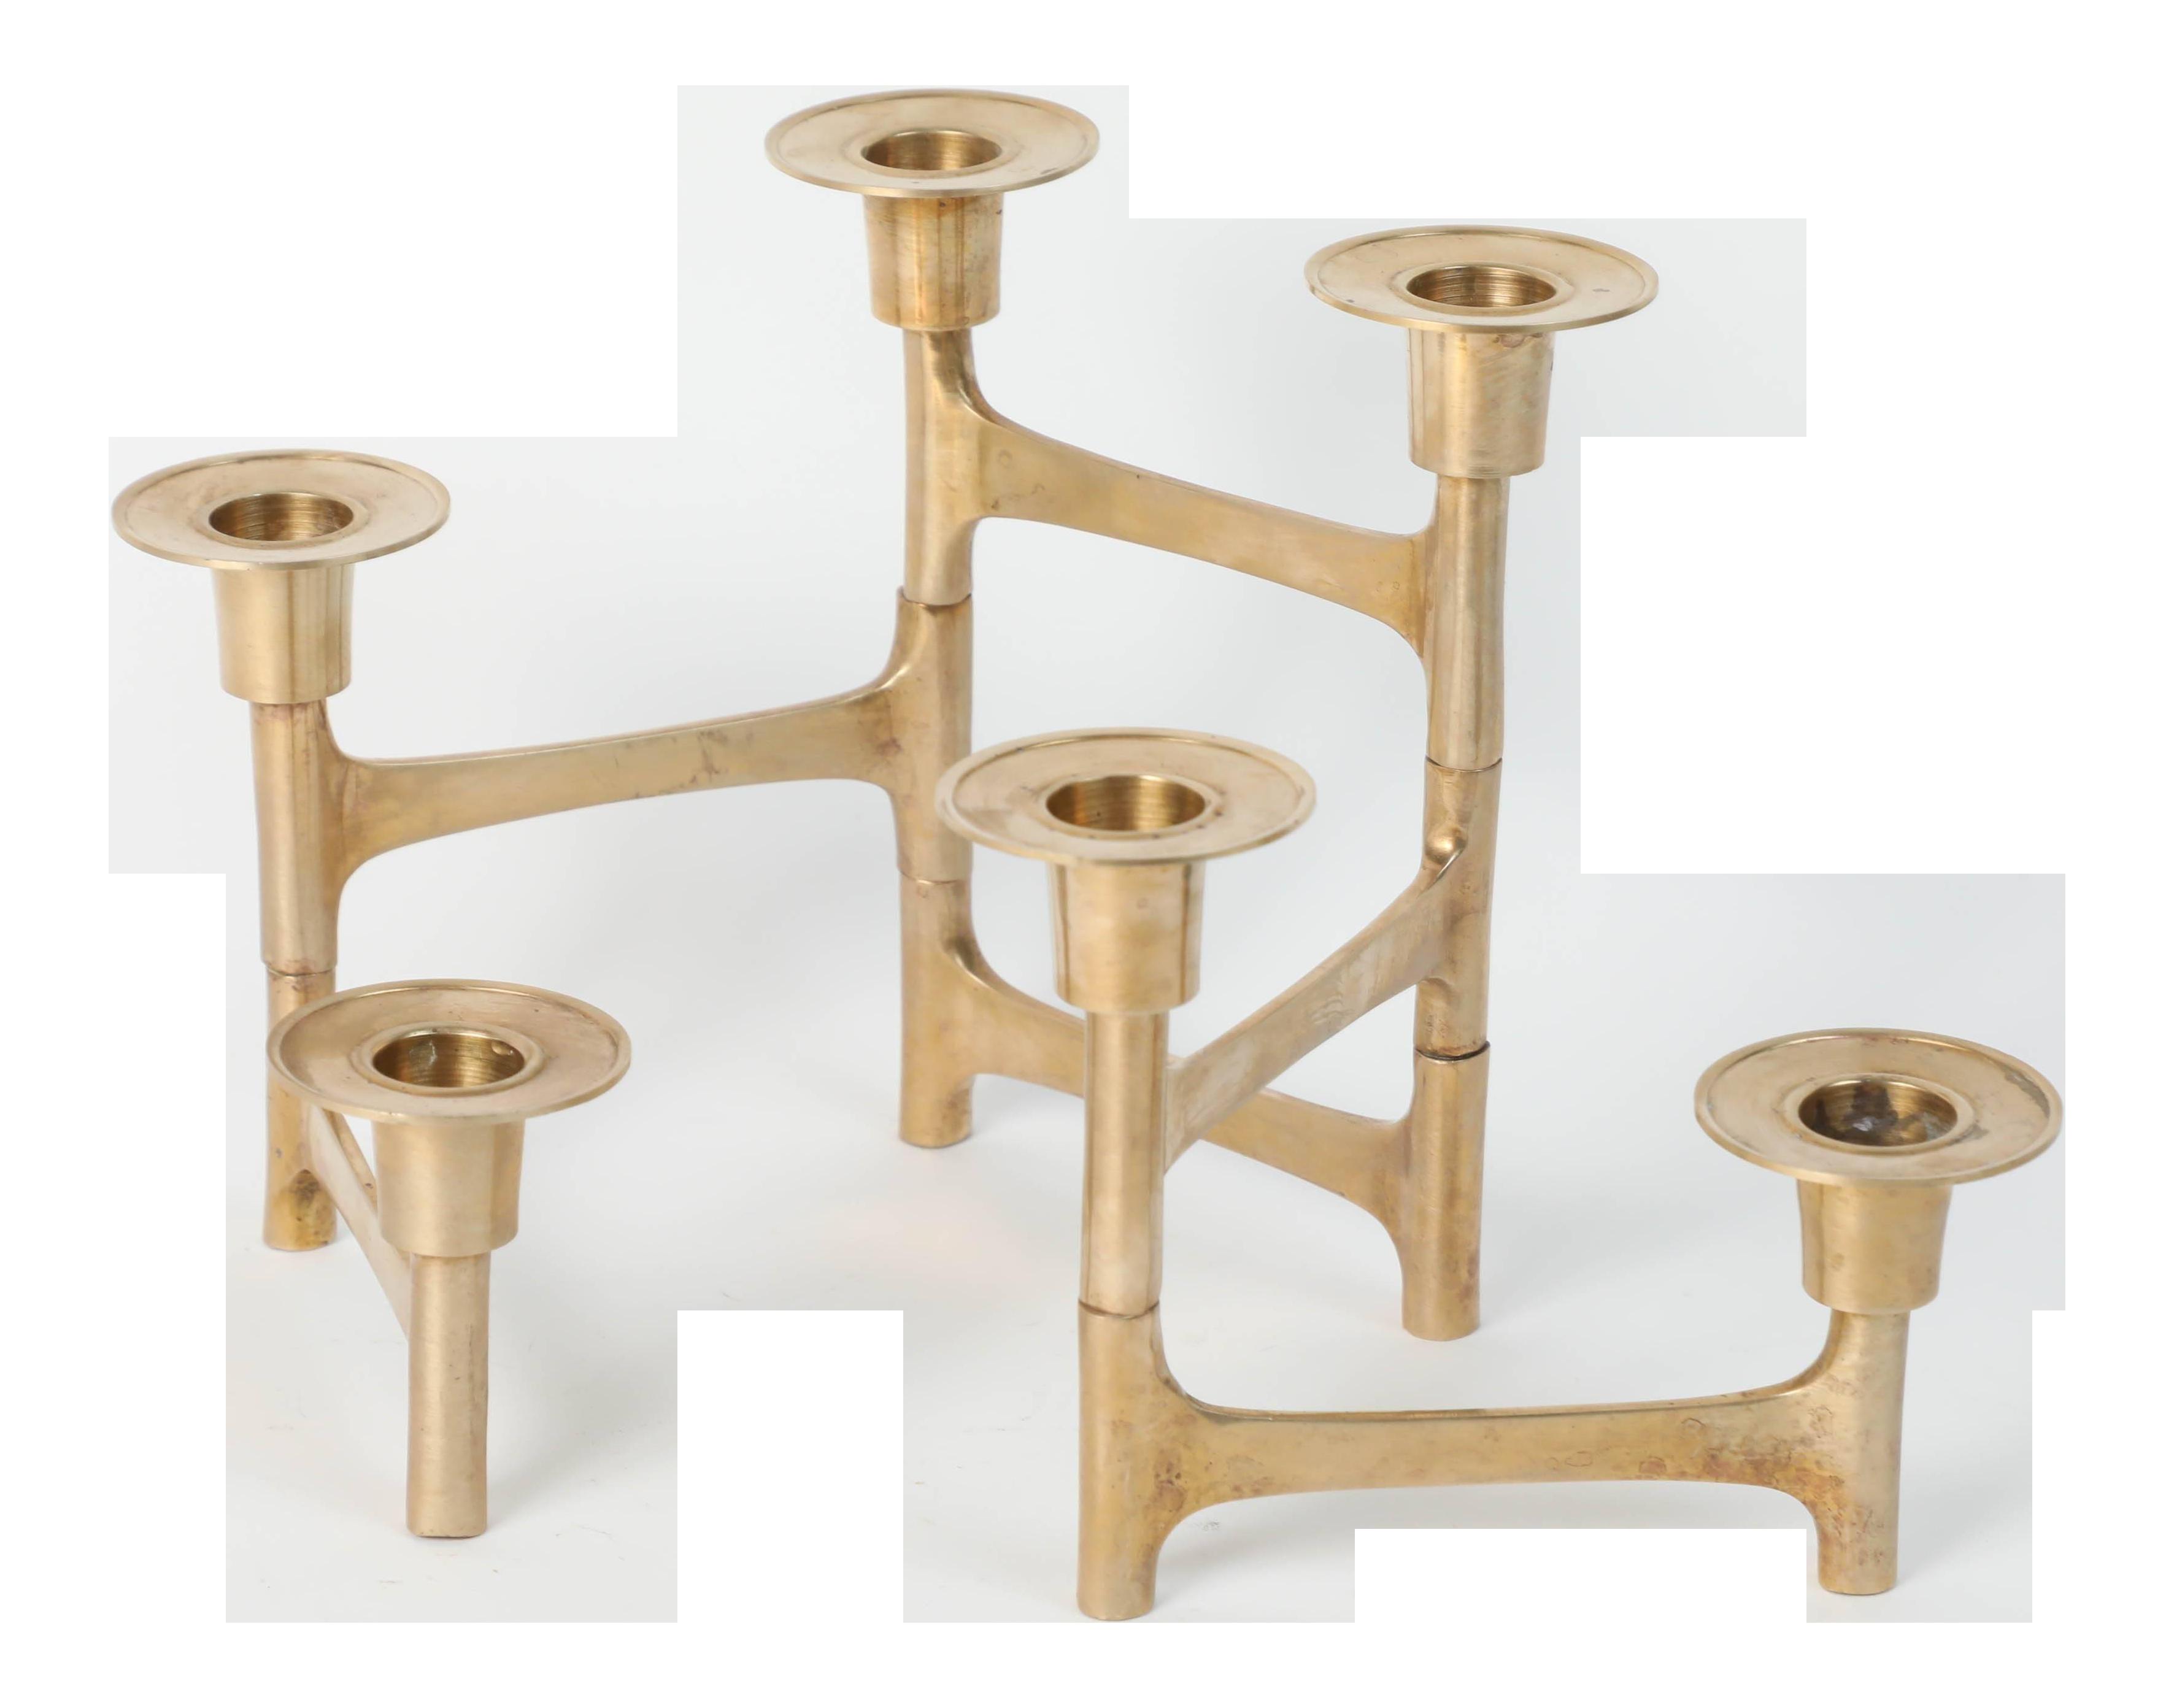 Danish Mid Century Modern Brass Articulating Candleholder Nagel Style Chairish